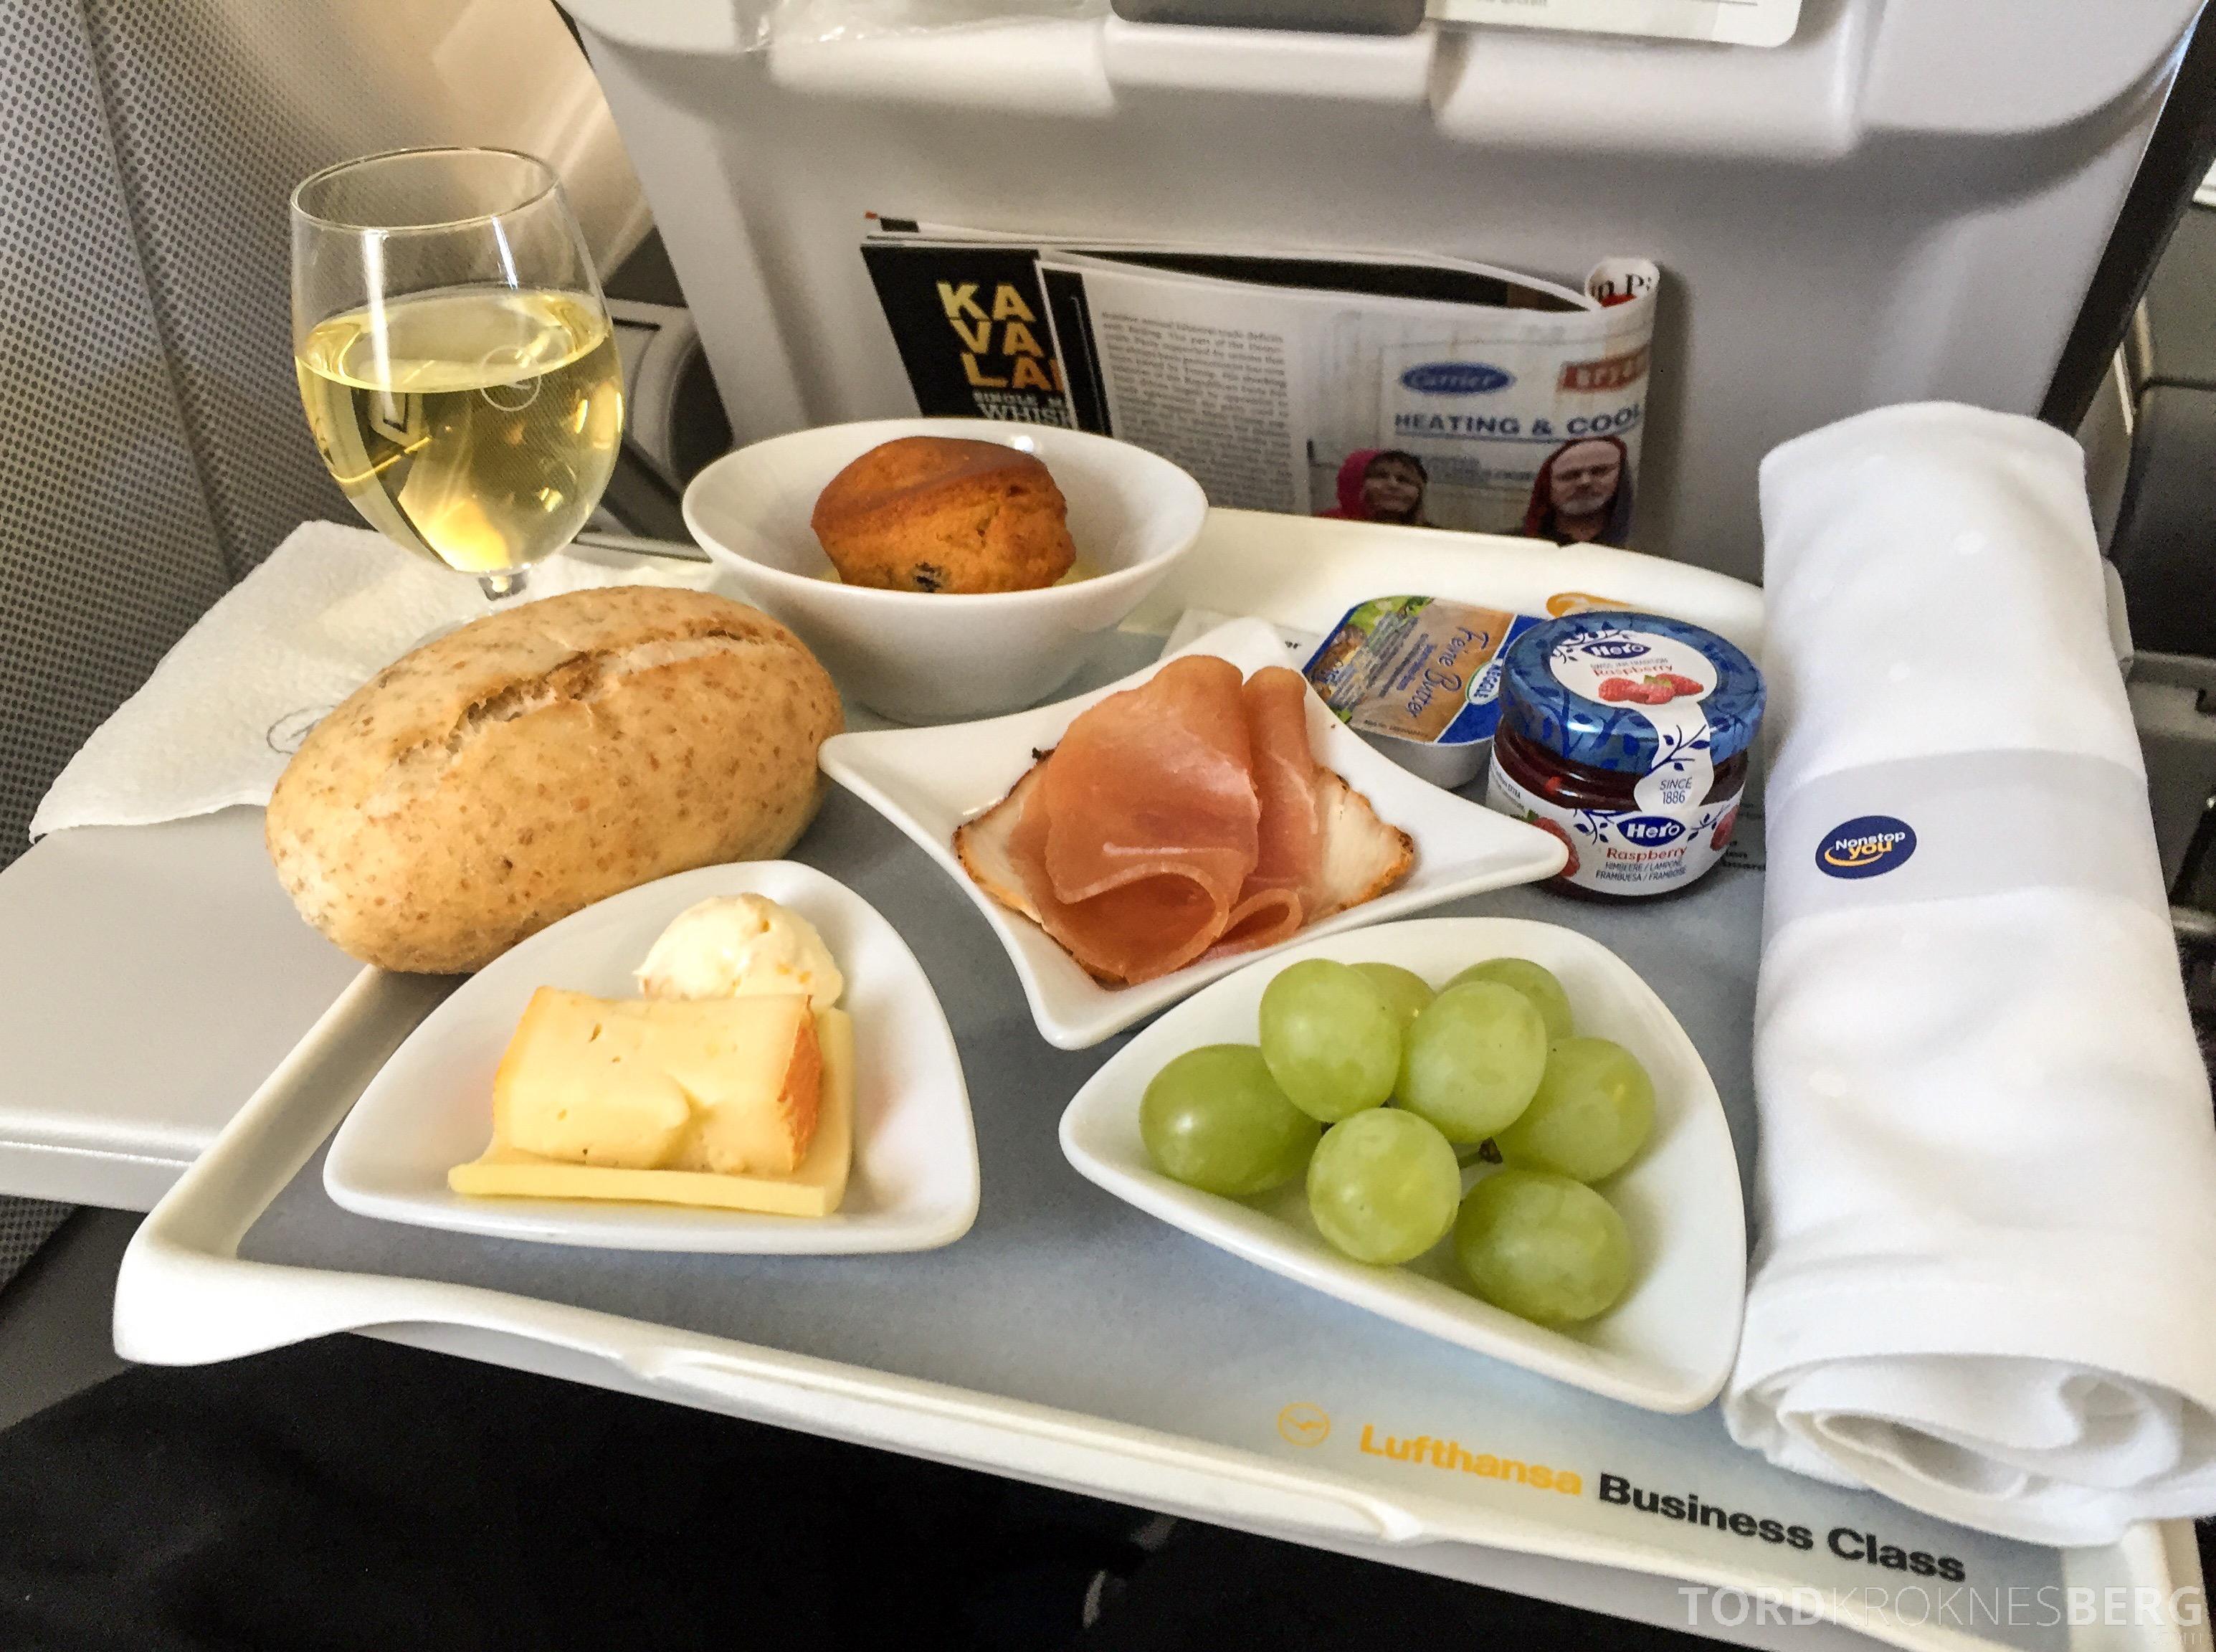 Lufthansa Business Class i Europa fra Oslo til München mat ombord